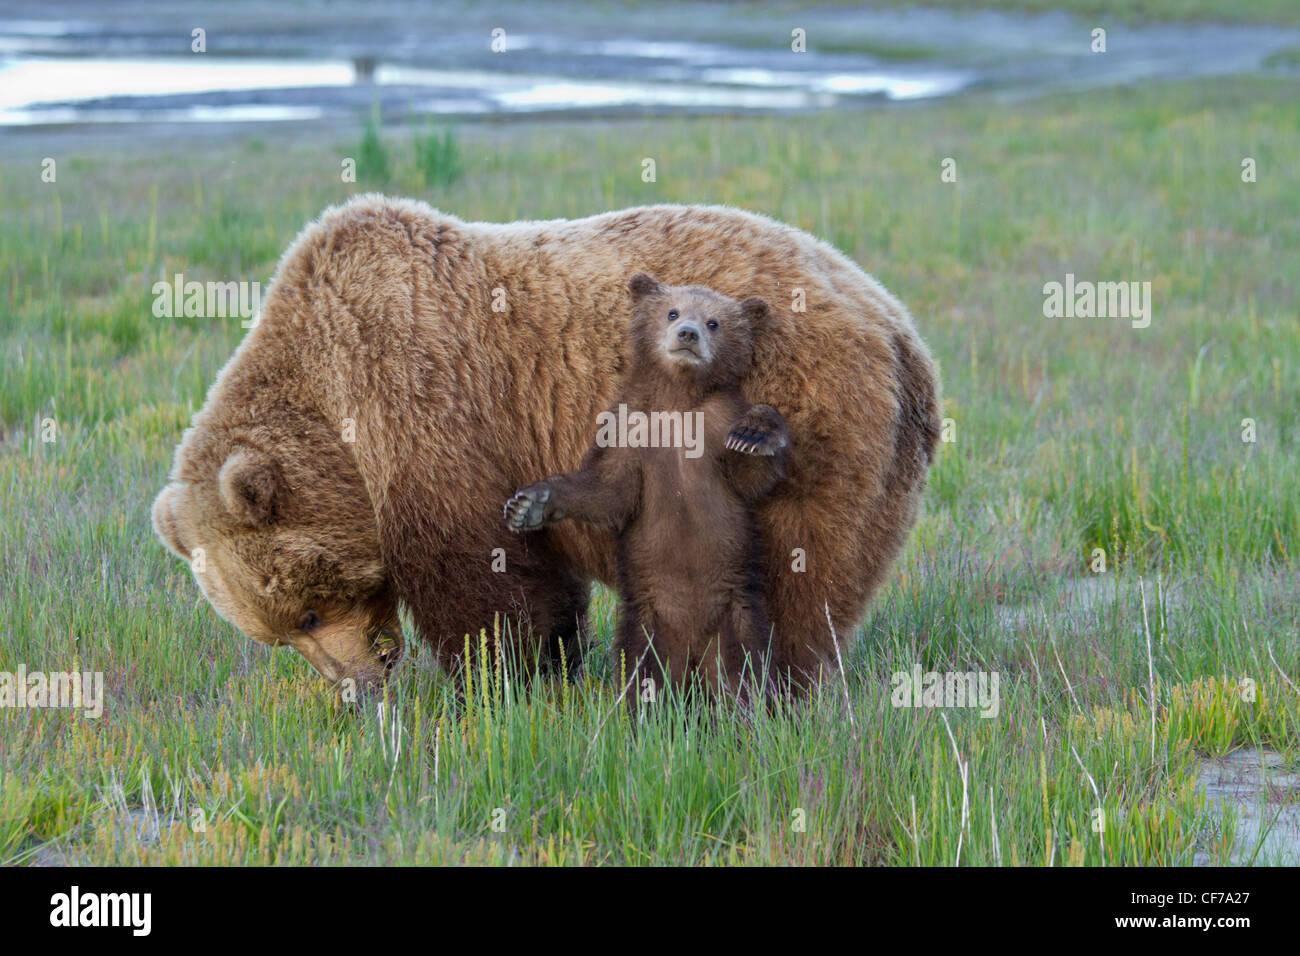 Alaskan brown bear mother with cub in Lake Clark National Park - Stock Image